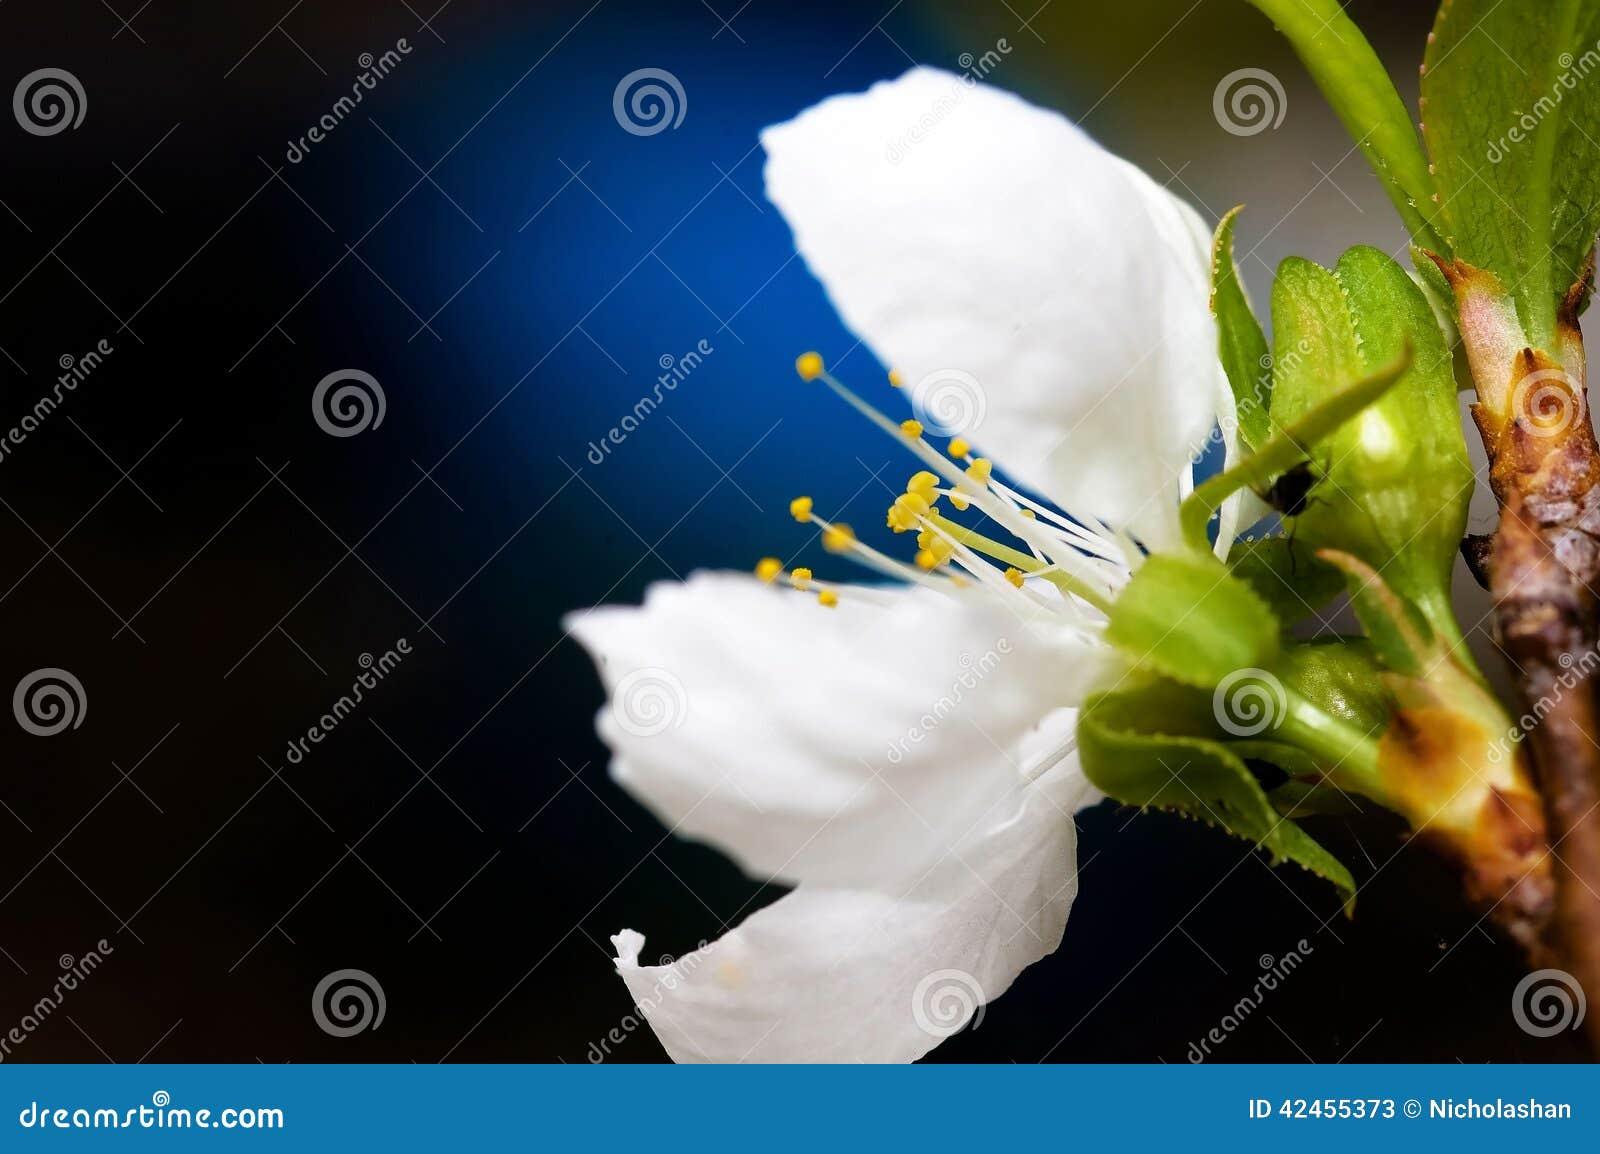 Pastelltöne Frühlings-Blütennahaufnahme